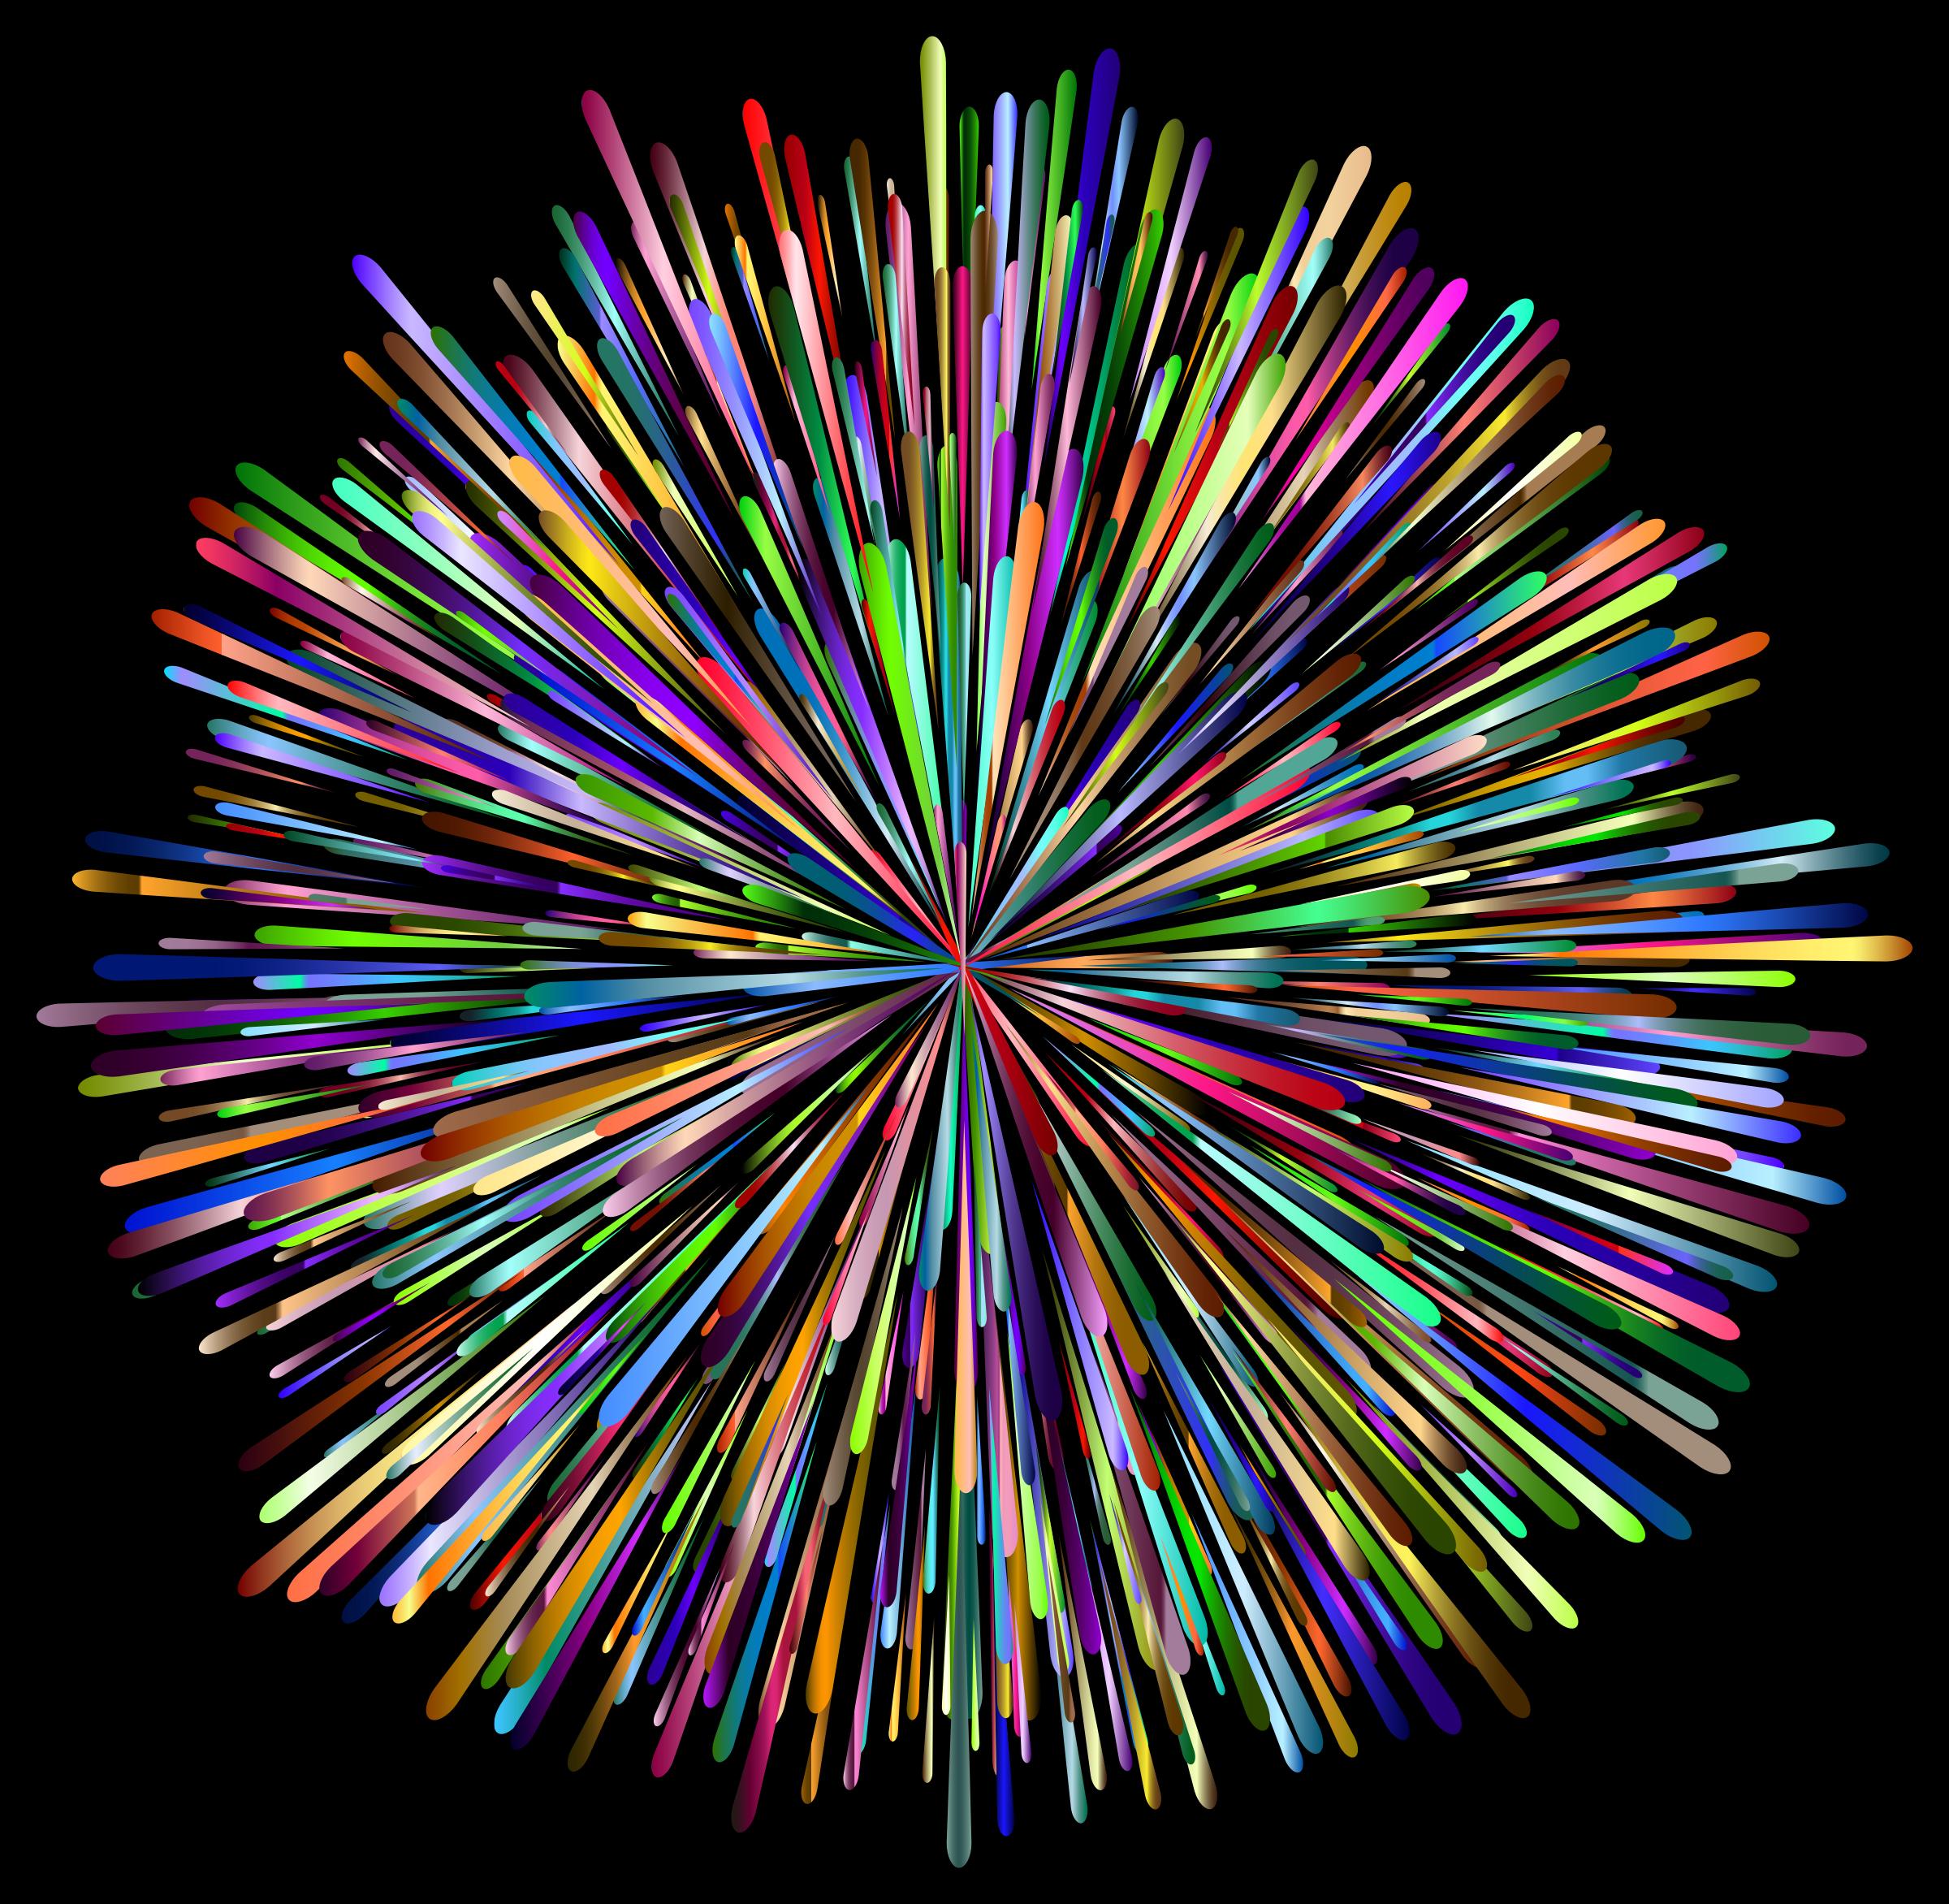 Clipart - Prismatic Fireworks 4